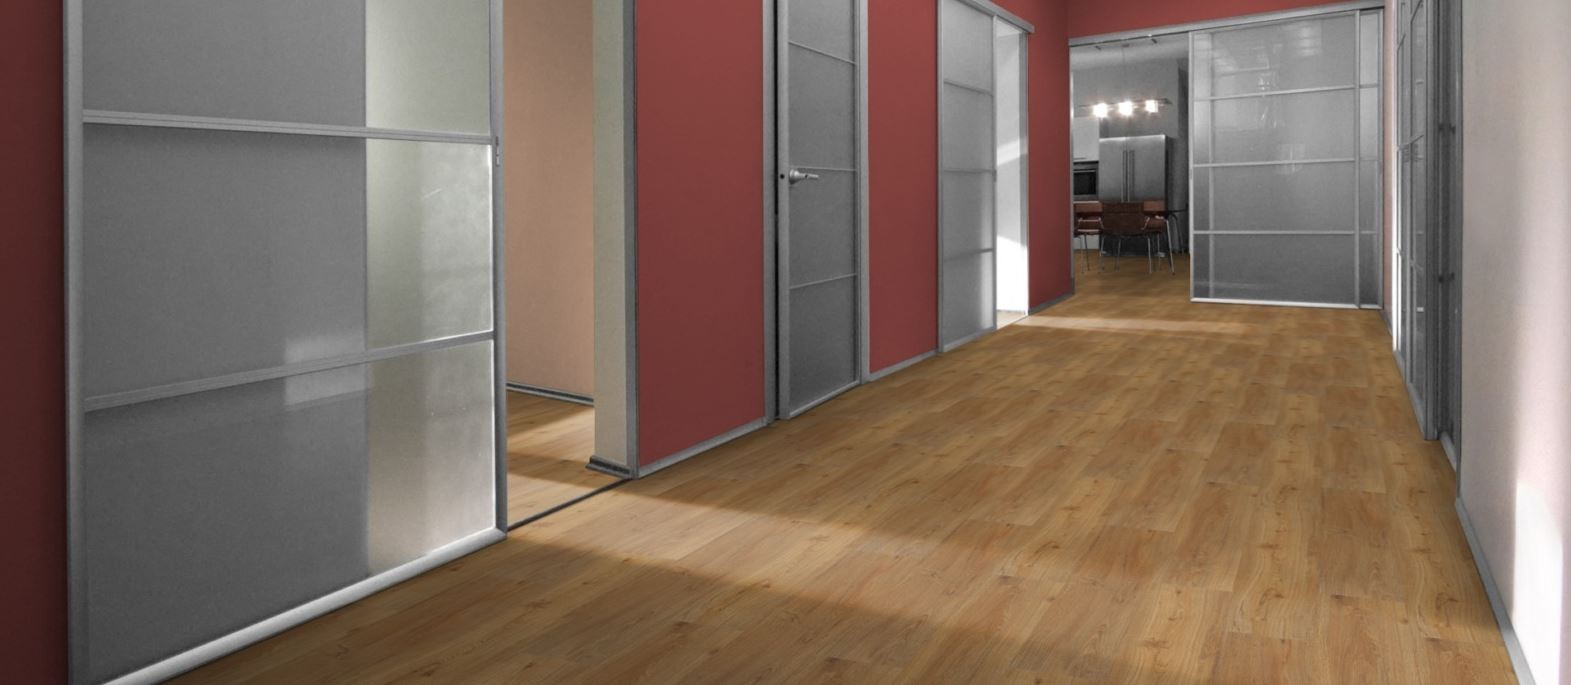 klick vinyl kaufen klick vinyl online kaufen vinylboden. Black Bedroom Furniture Sets. Home Design Ideas